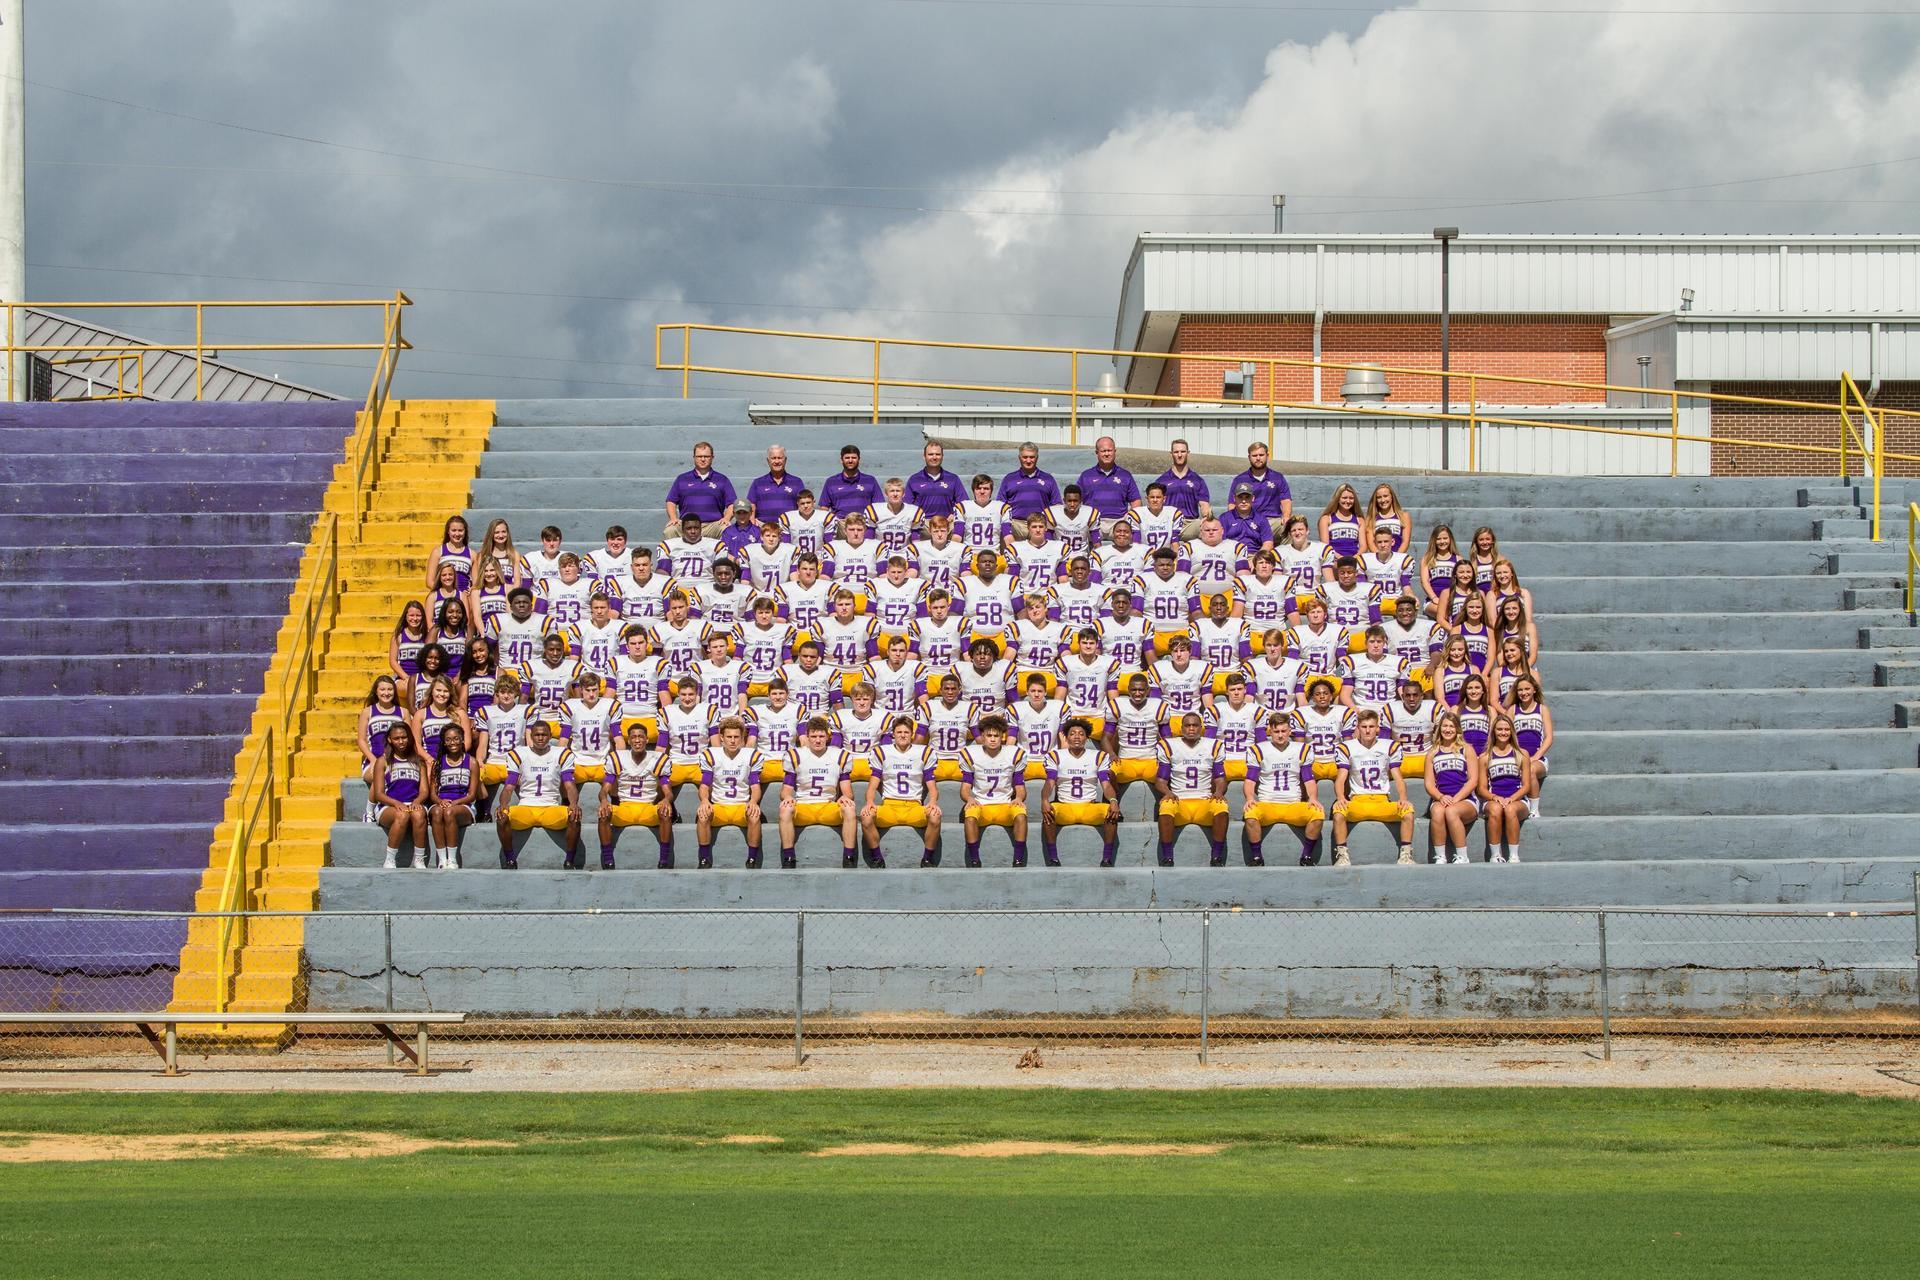 BCHS 2018 Football Team & Cheerleaders